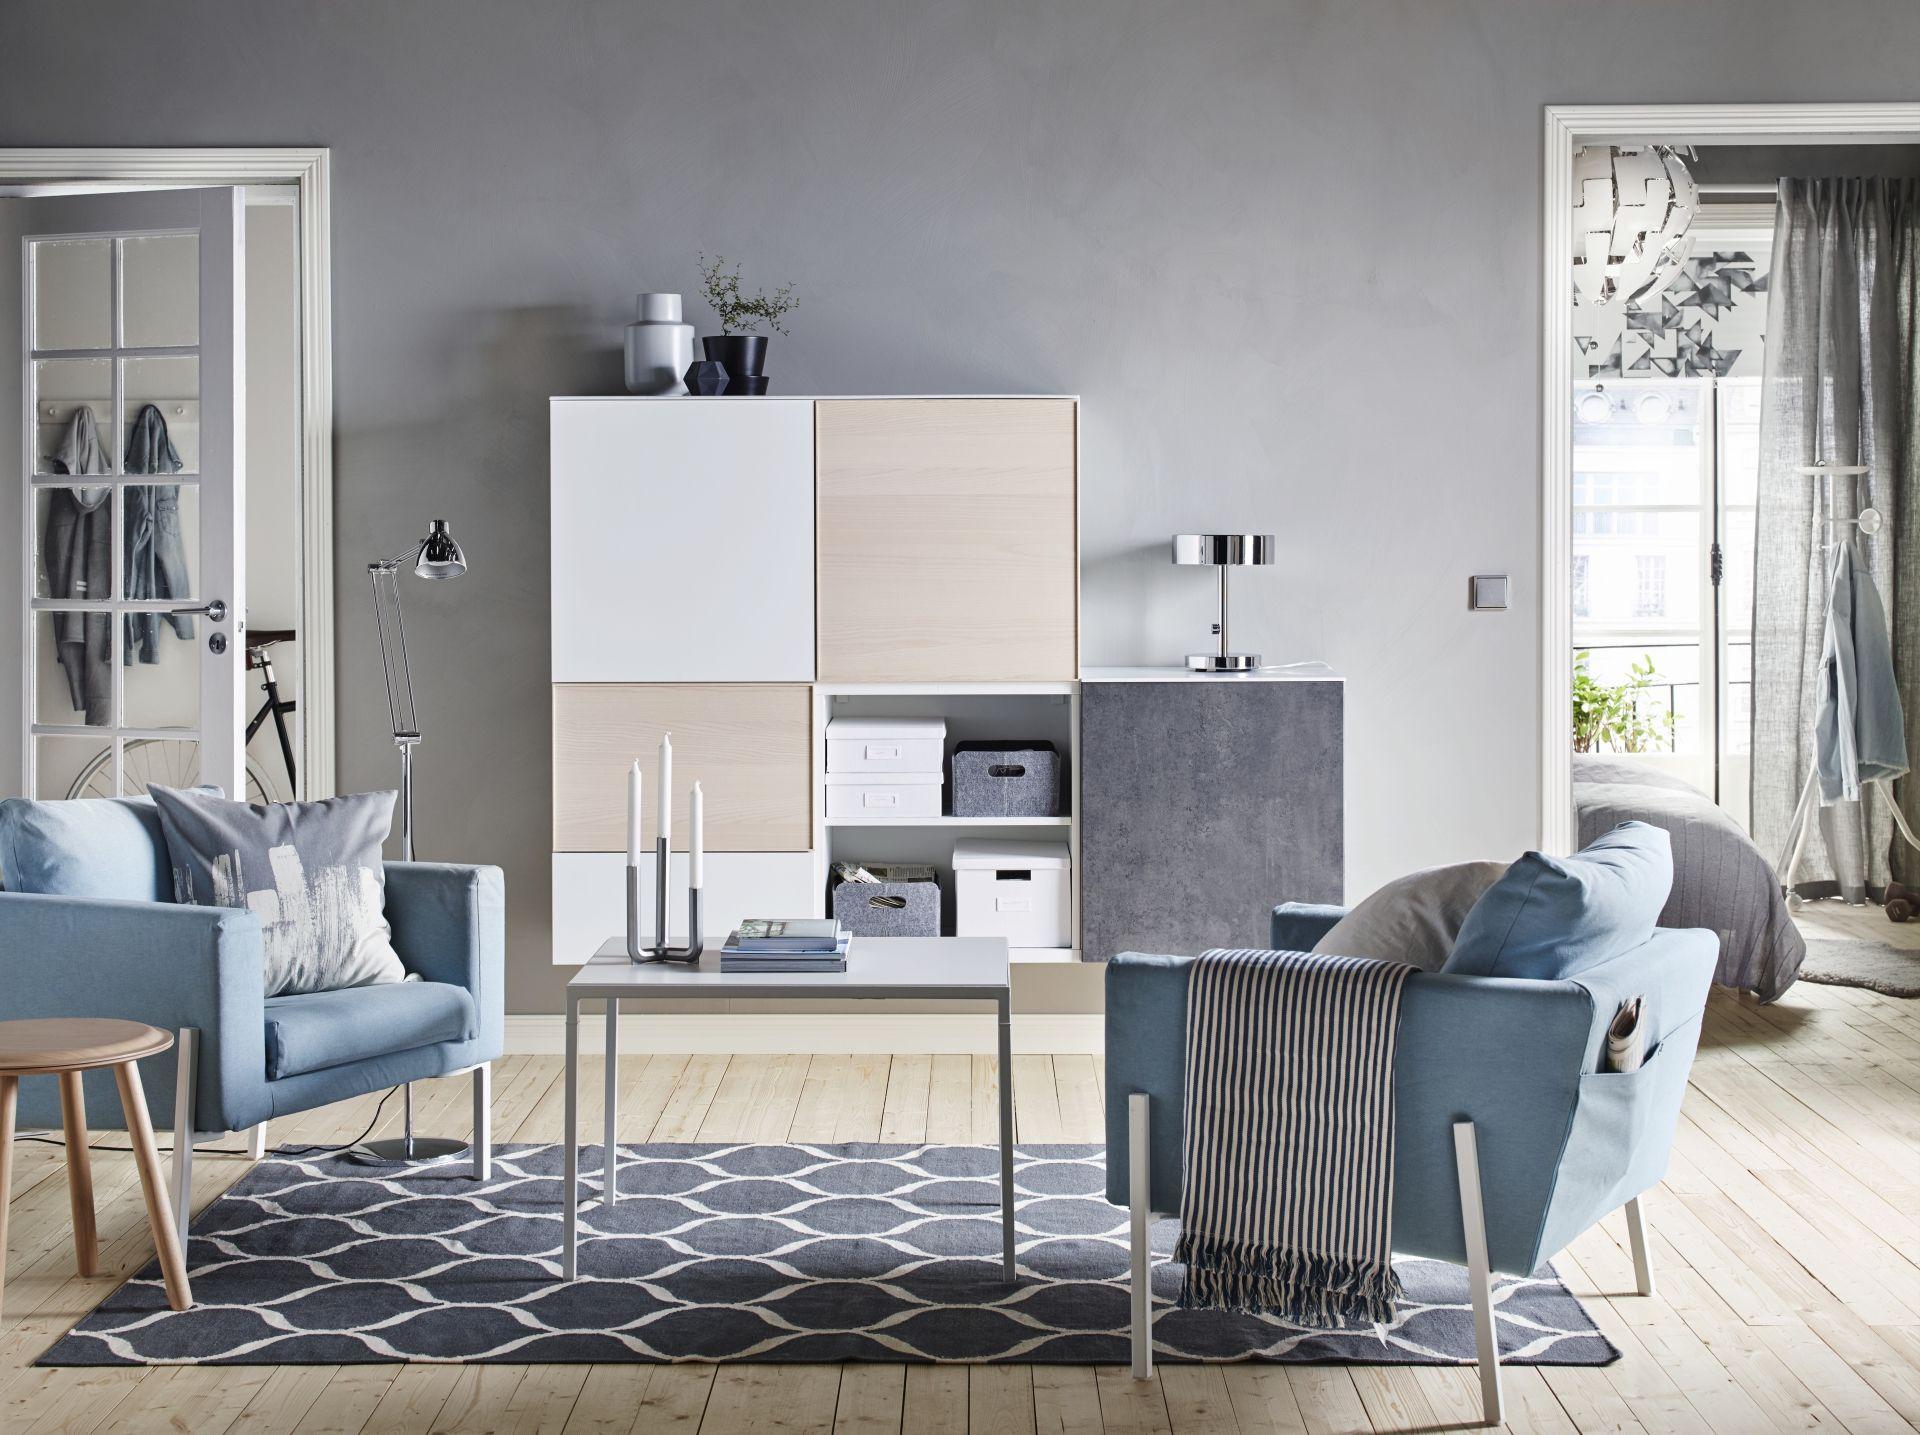 KOARP Fauteuil, Orrsta lichtblauw, wit | Ikea interior, Interior ...